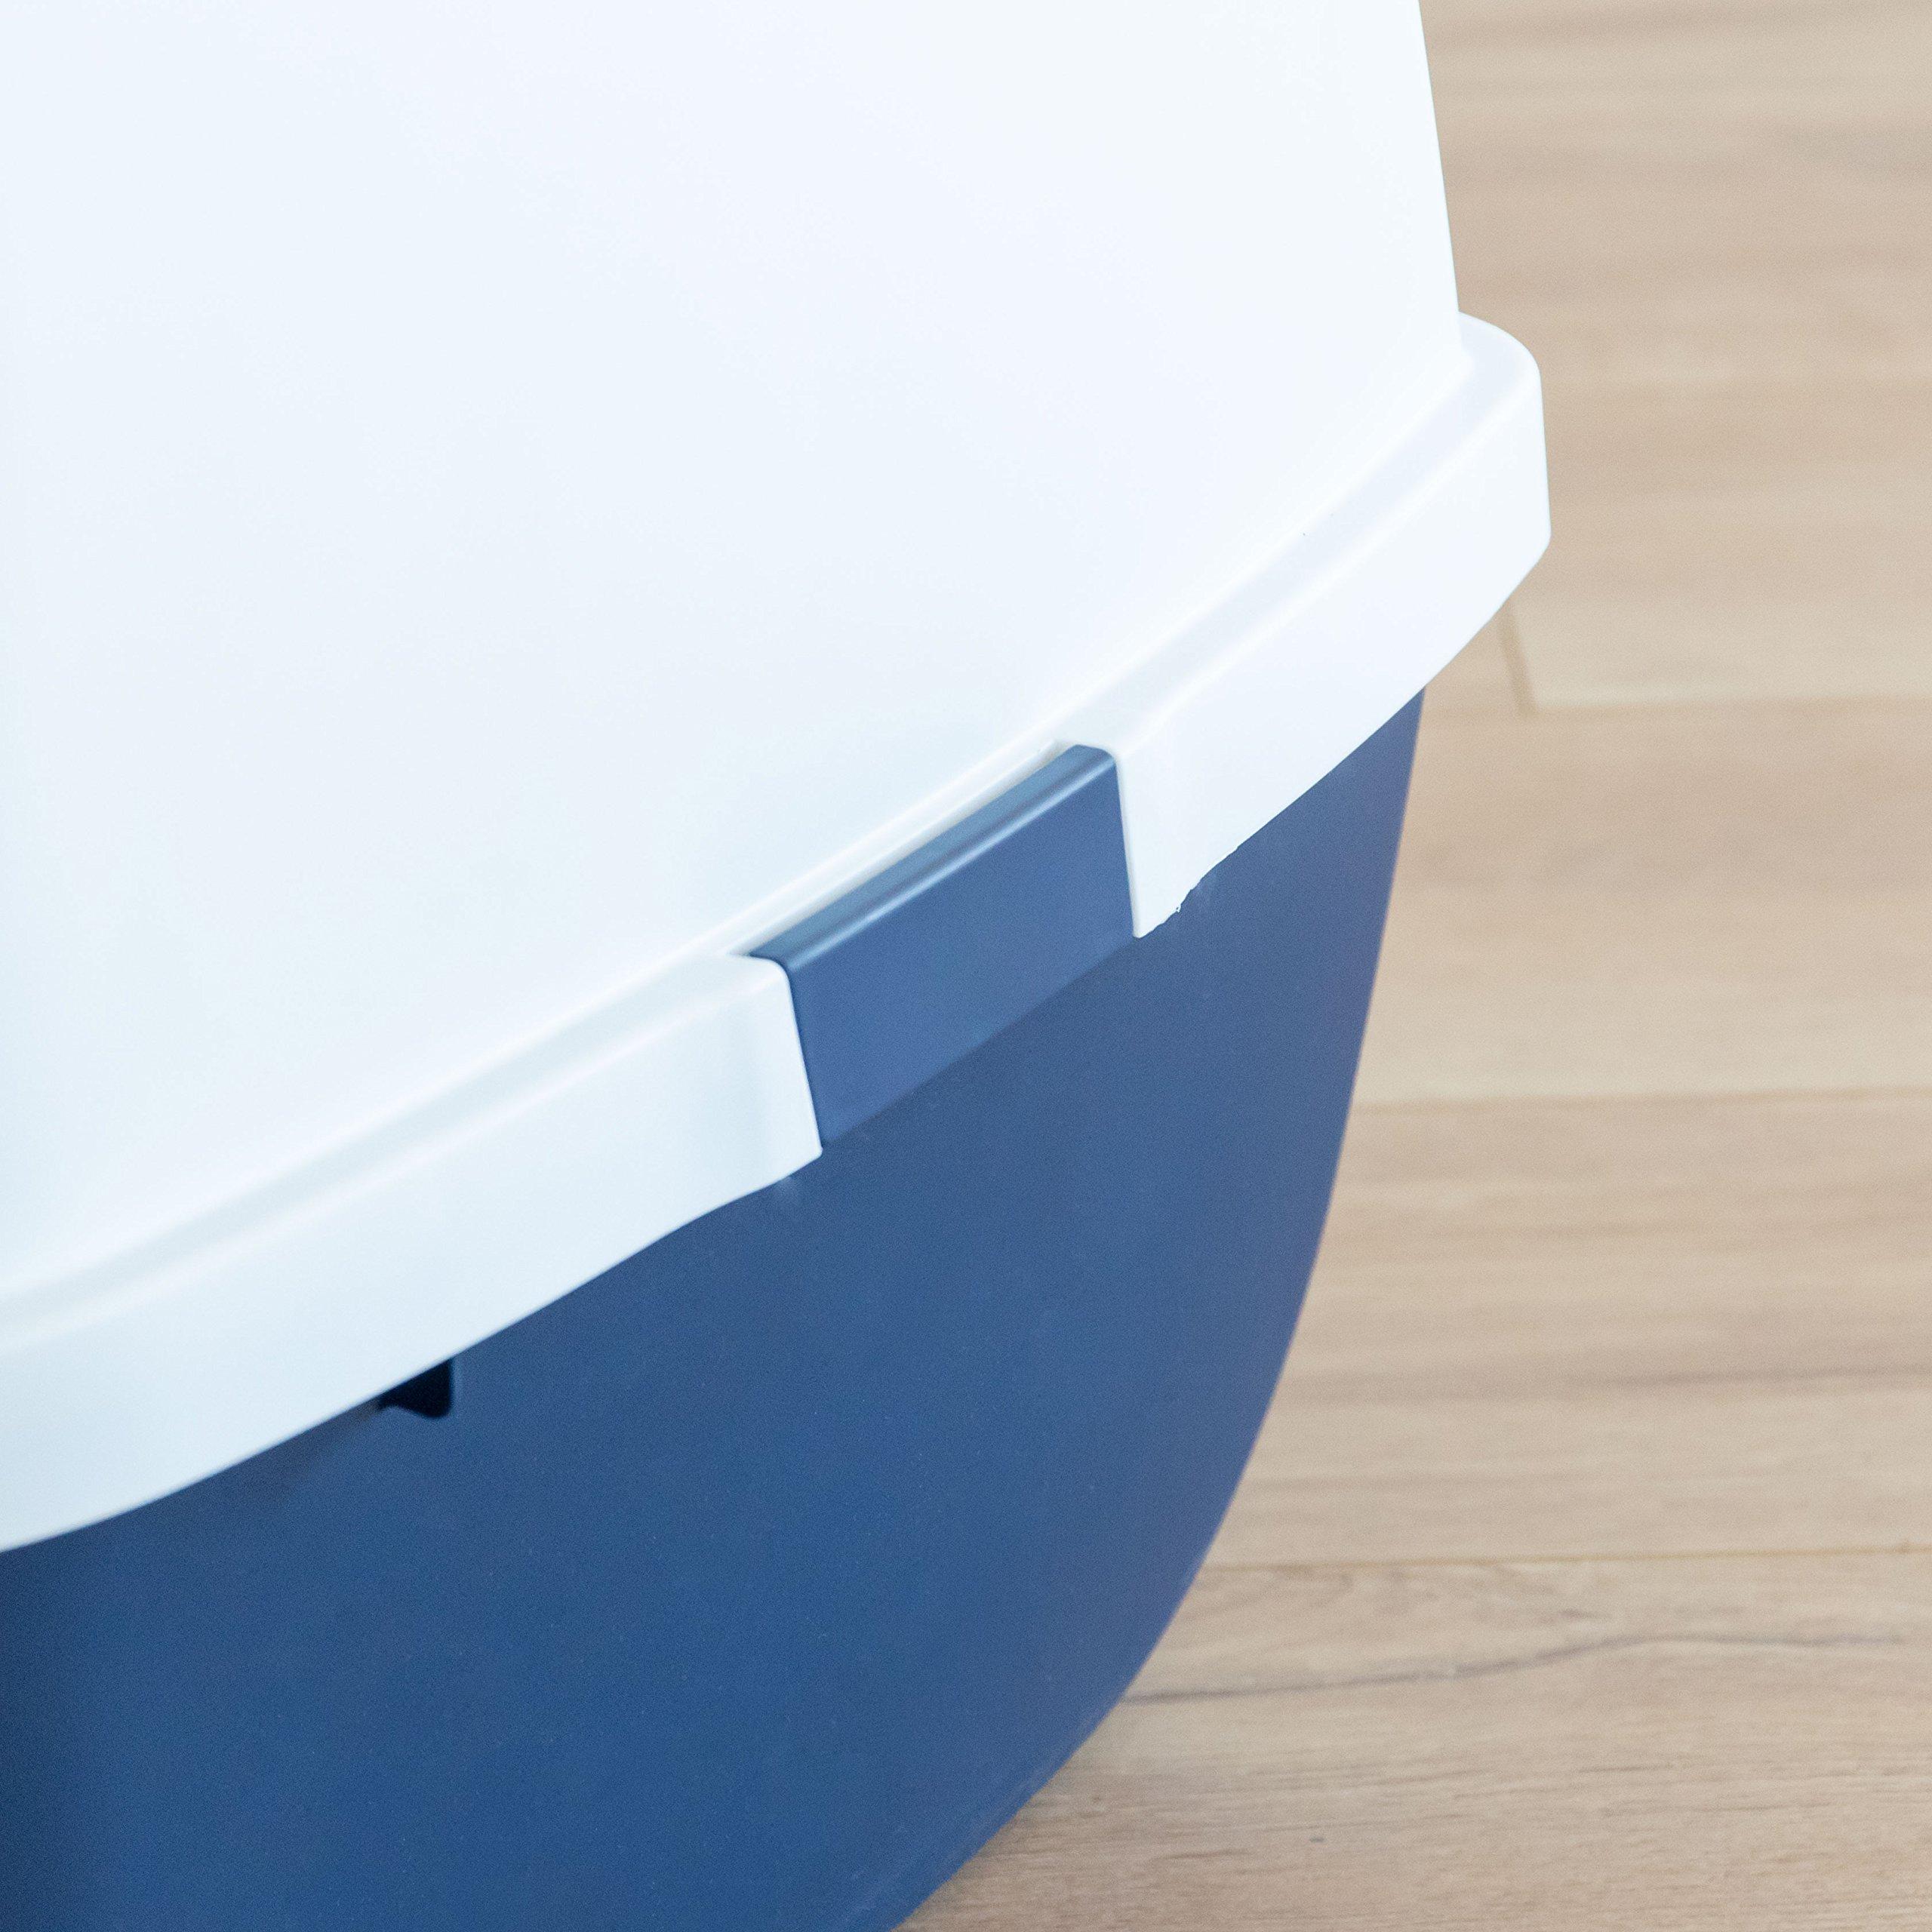 IRIS Jumbo Hooded Litter Box with Scoop, Navy by IRIS USA, Inc. (Image #5)